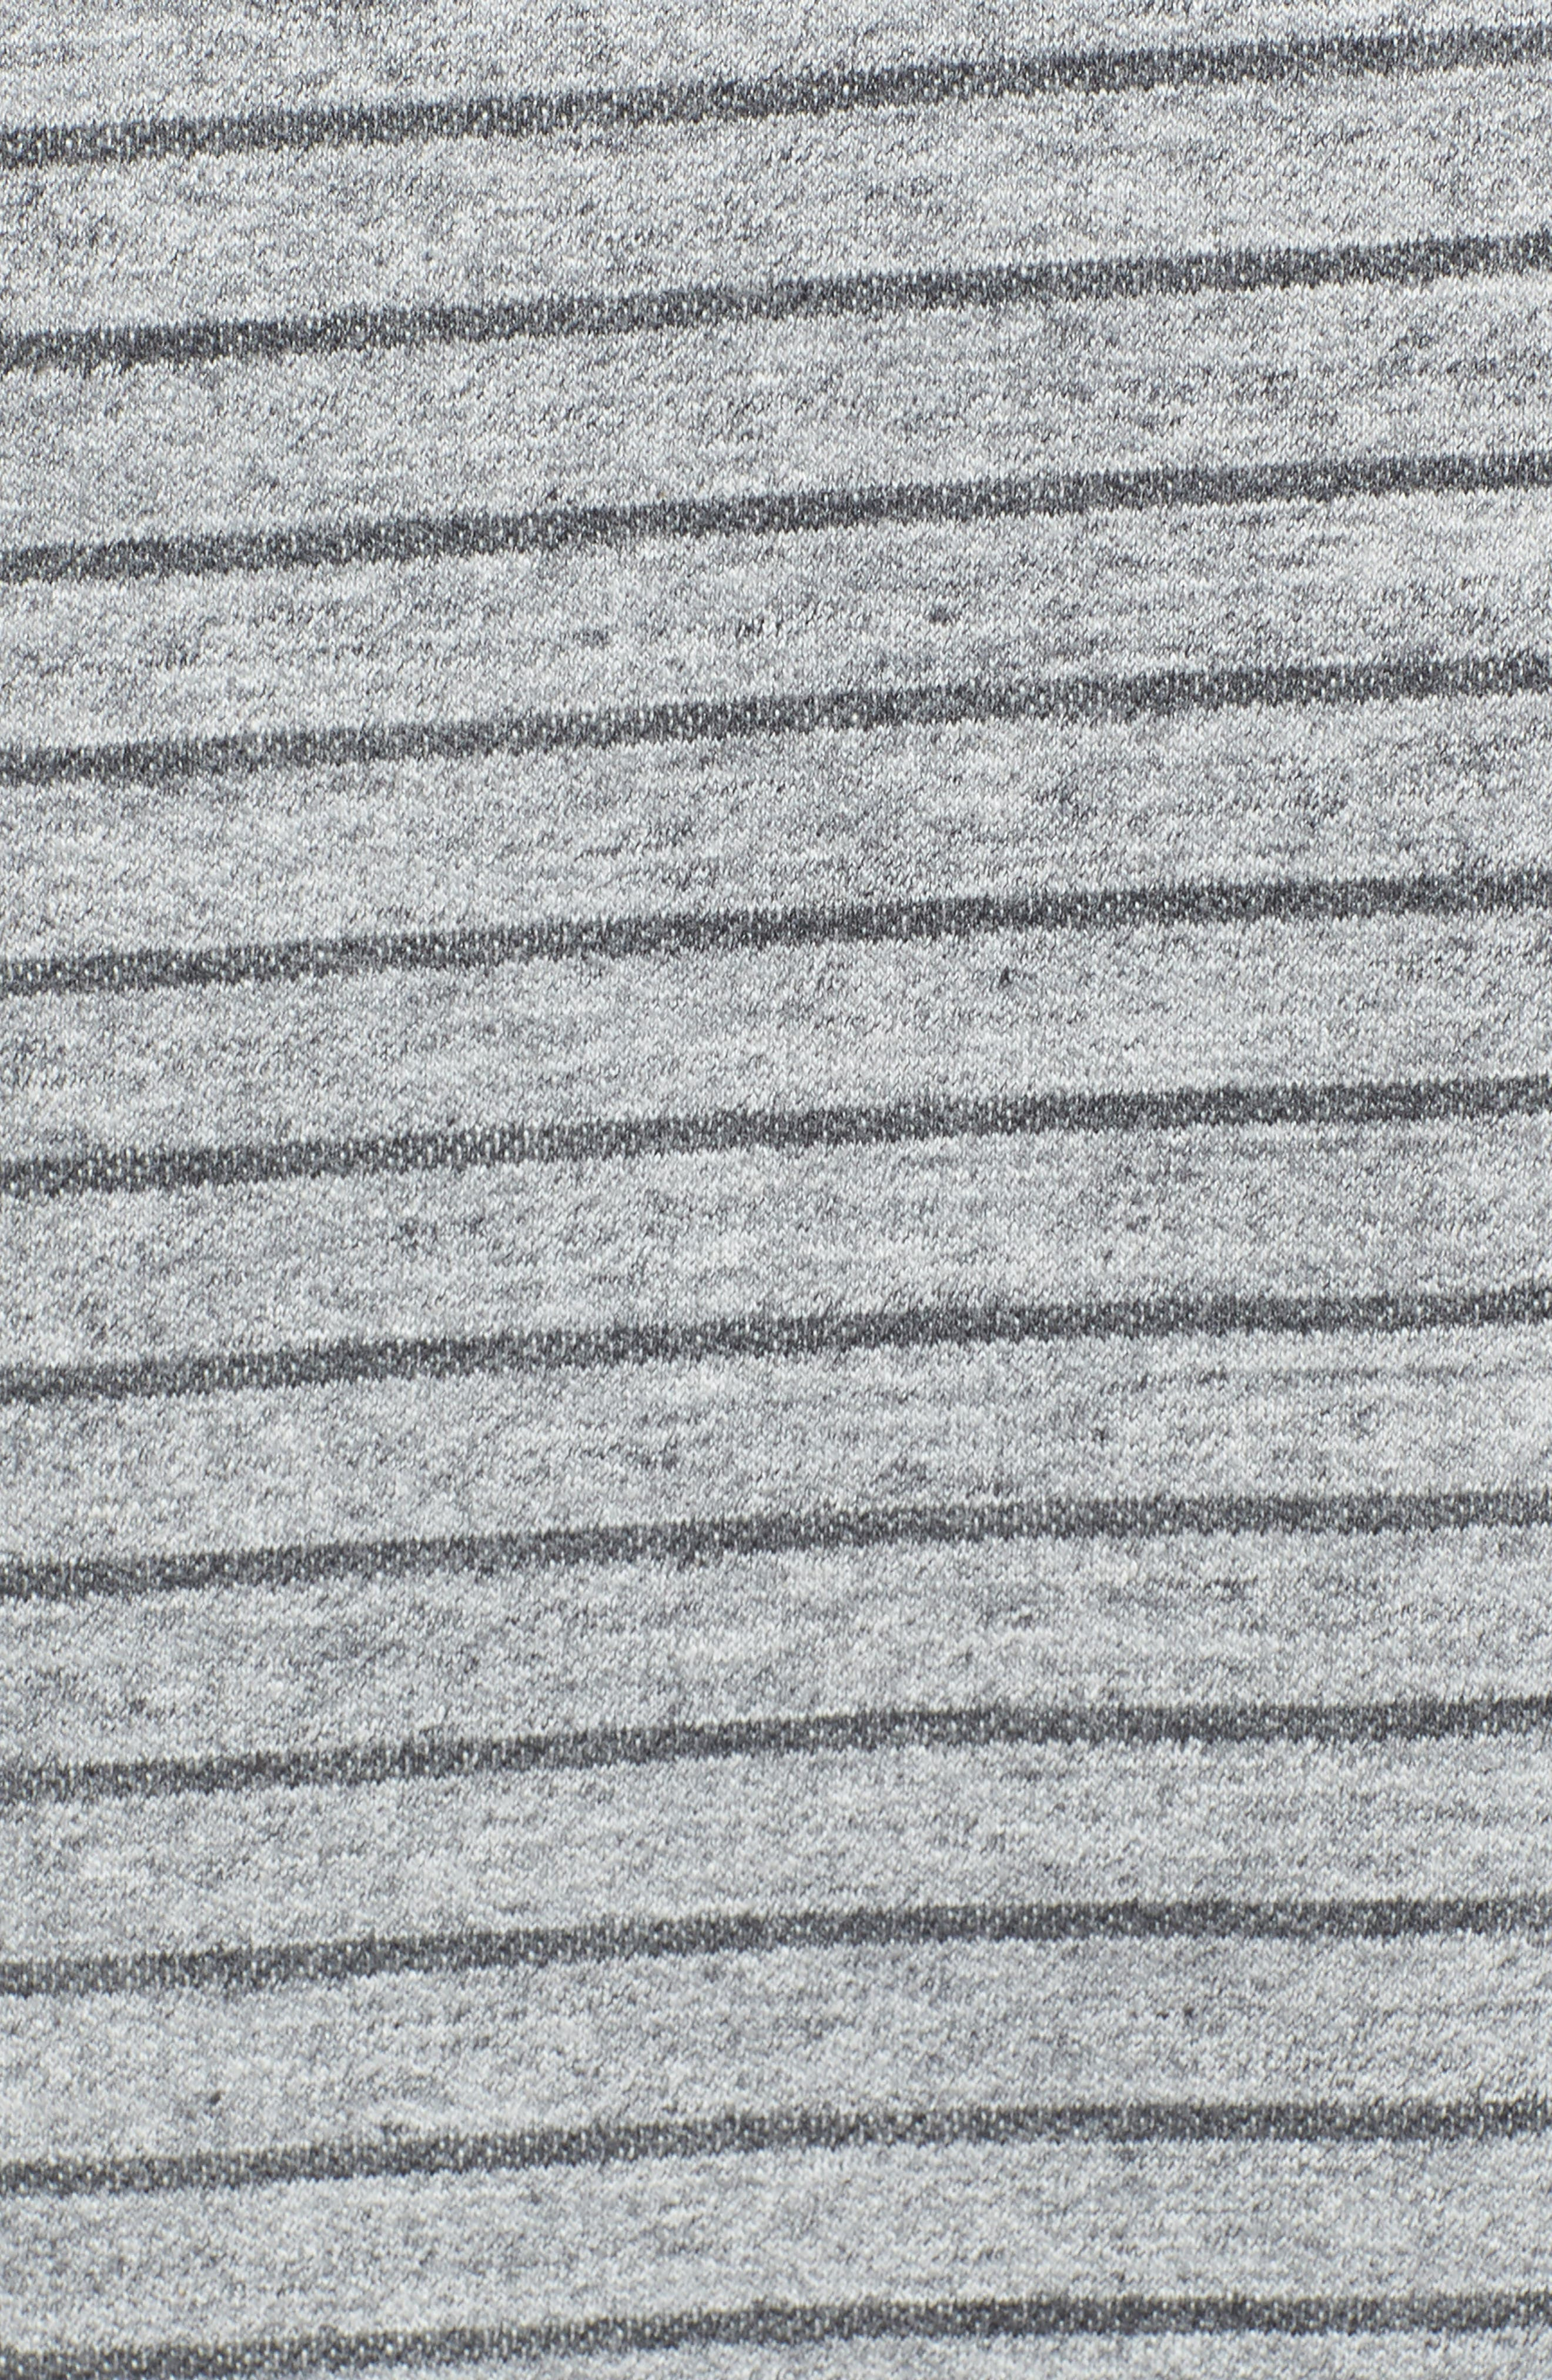 Palmer Modern Fit Athletic Stripe Sweatshirt,                             Alternate thumbnail 7, color,                             Gray Heather / Charcoal